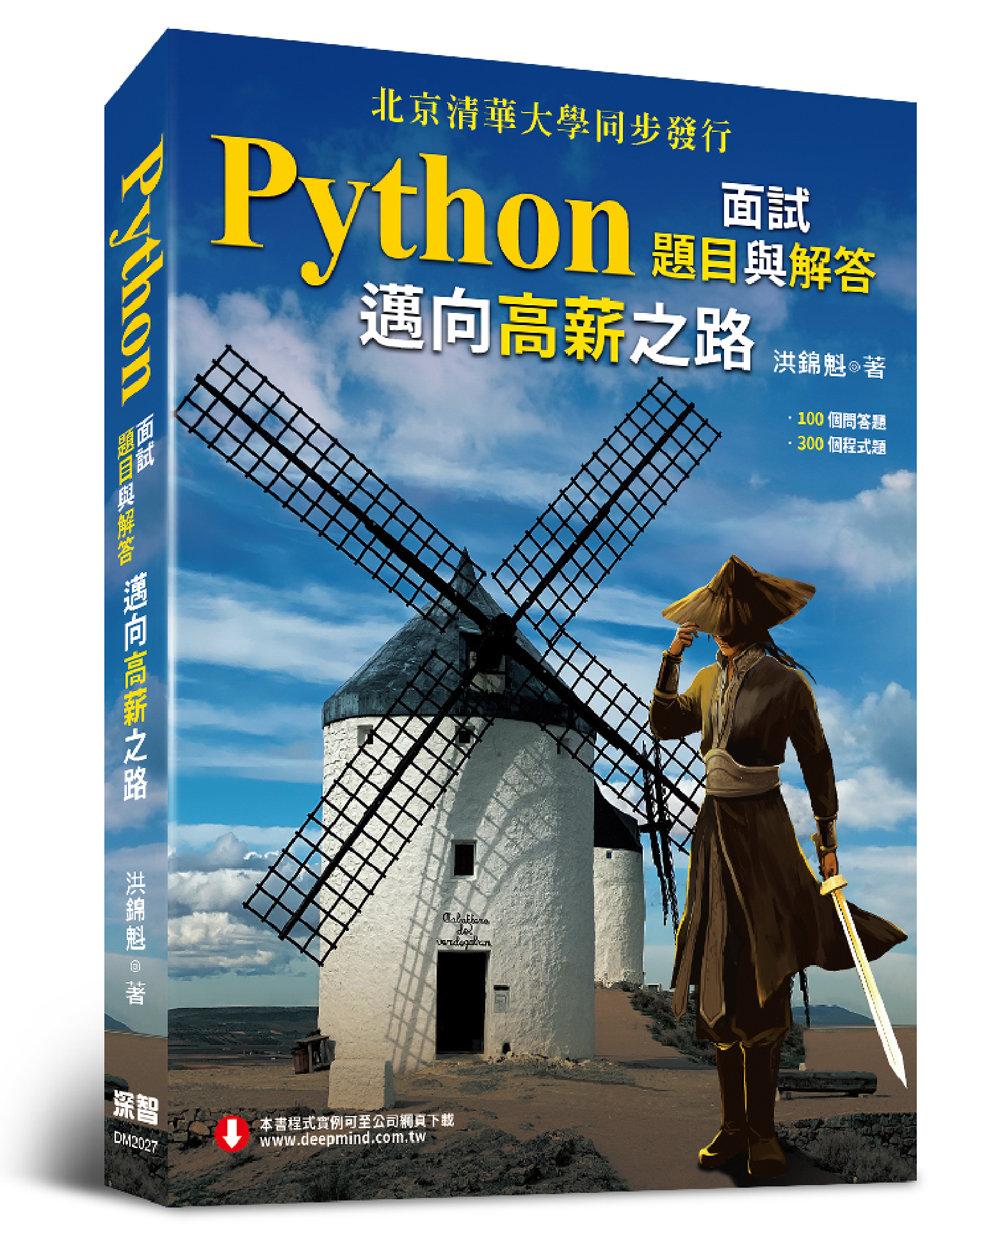 Python 面試題目與解答 -- 邁向高薪之路-preview-16